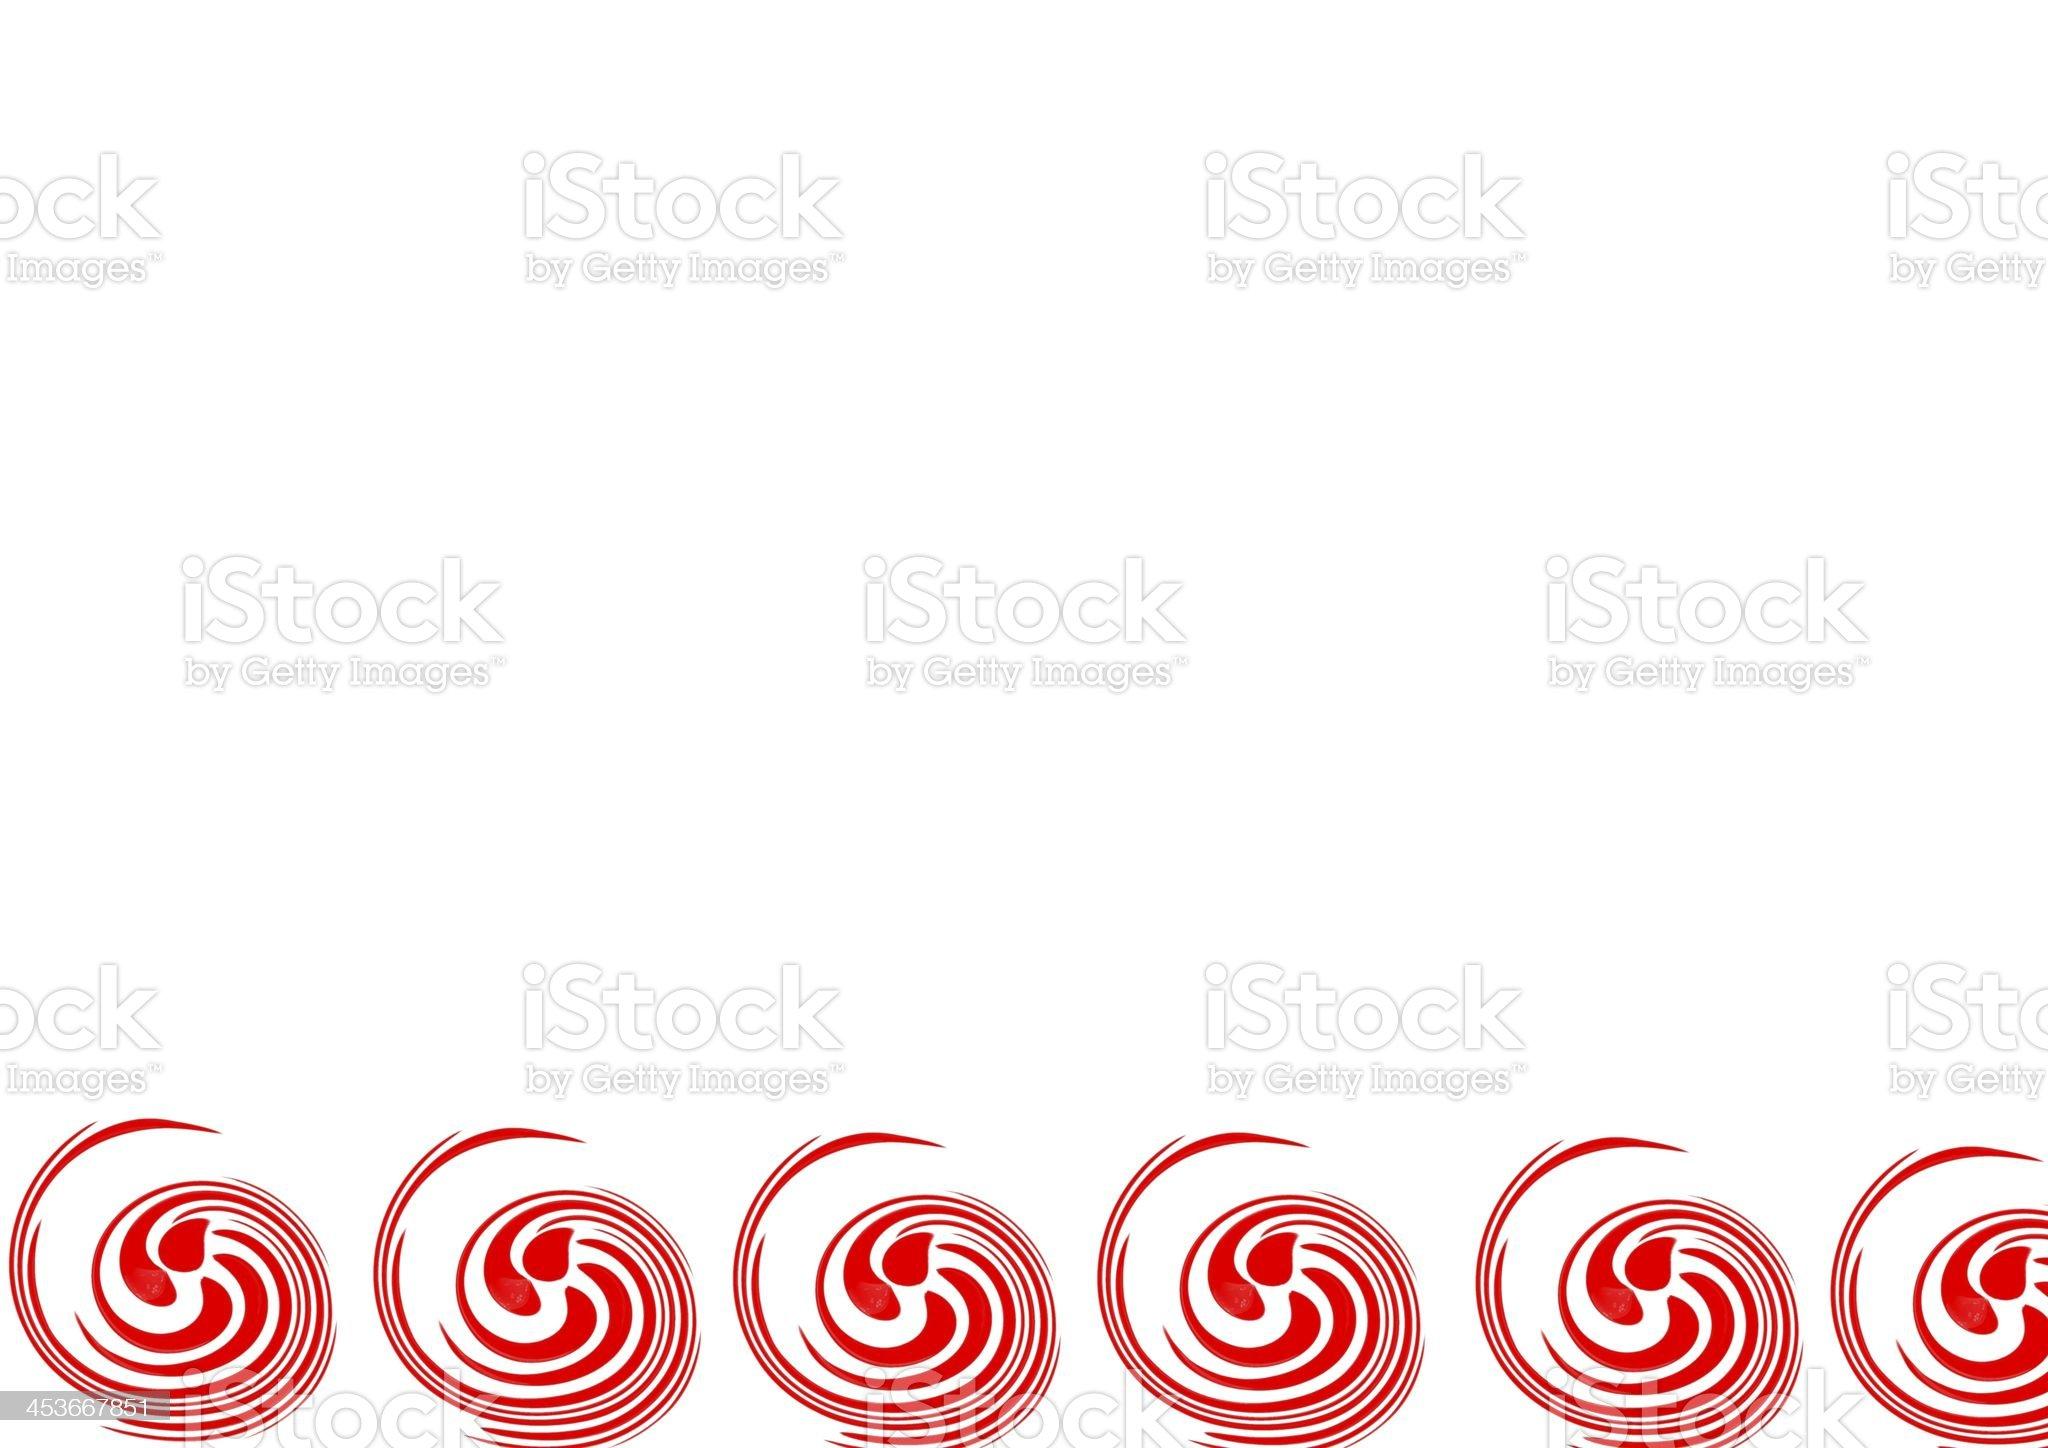 beautiful pattern royalty-free stock vector art